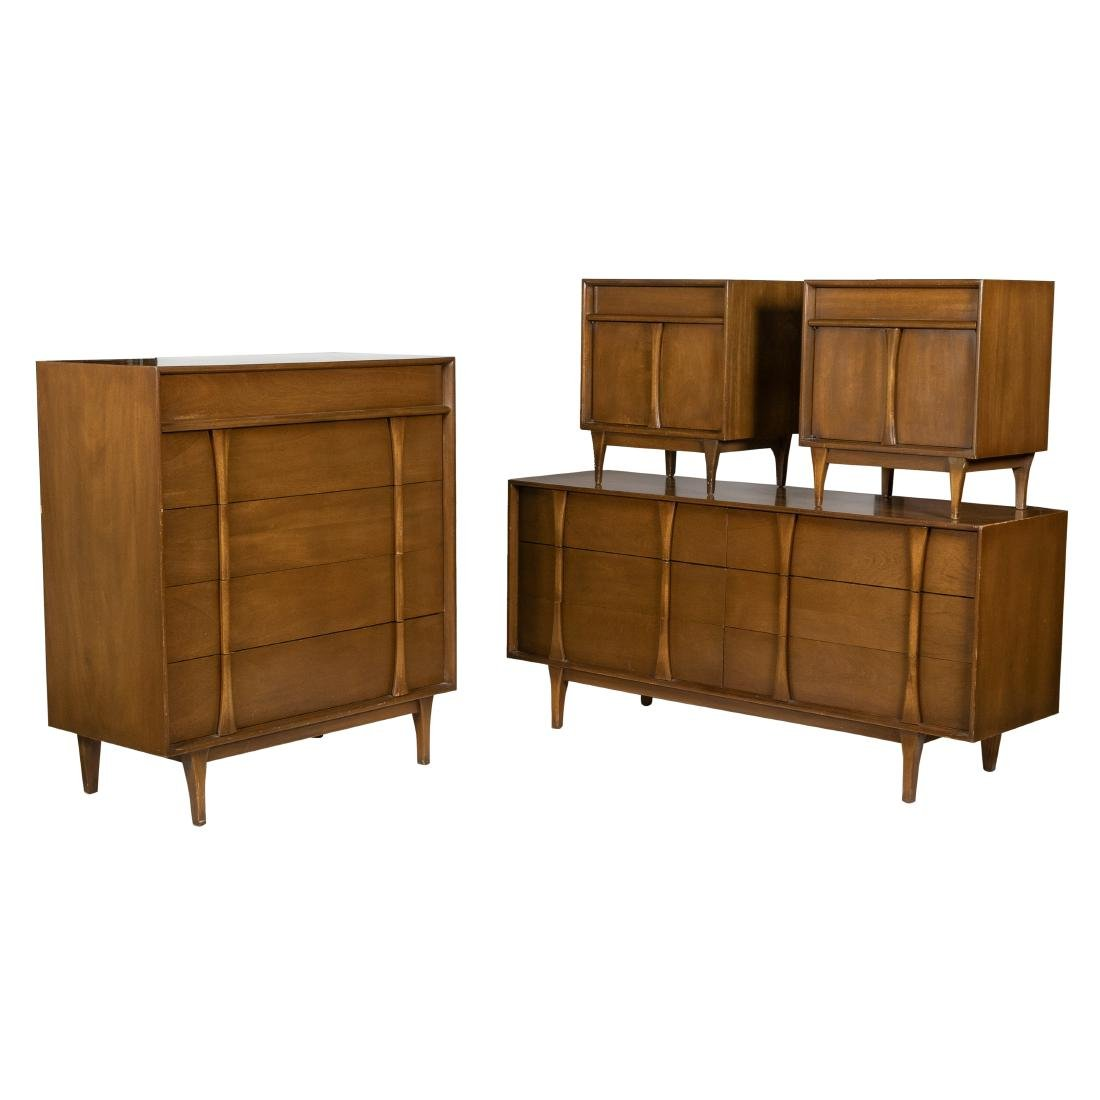 Mid Century Bedroom Set - 4 Piece